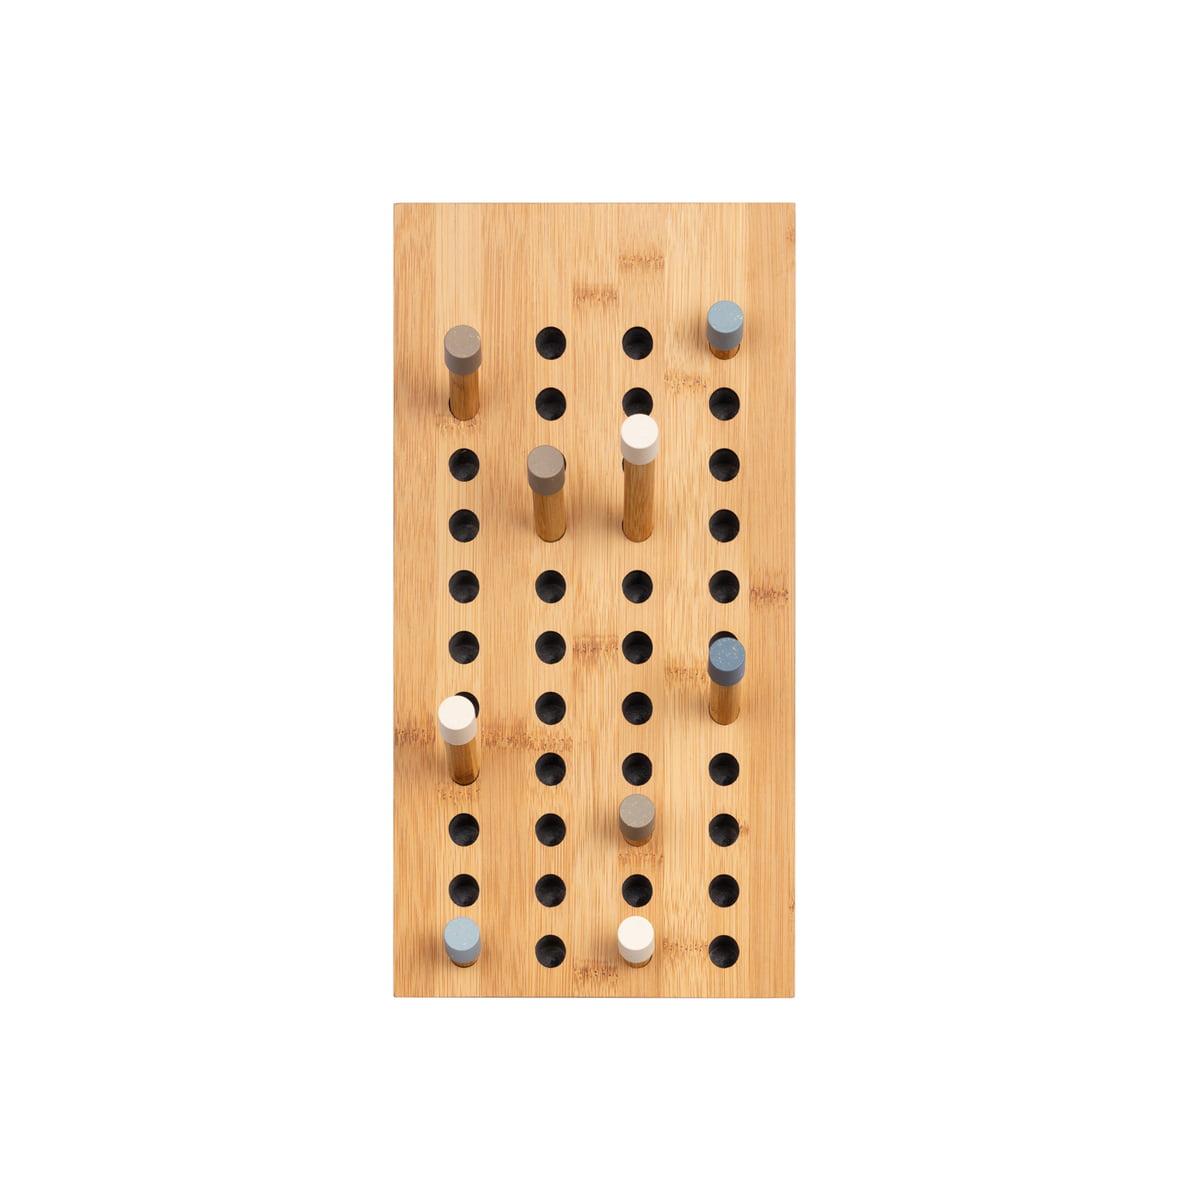 scoreboard garderobe von we do wood connox. Black Bedroom Furniture Sets. Home Design Ideas